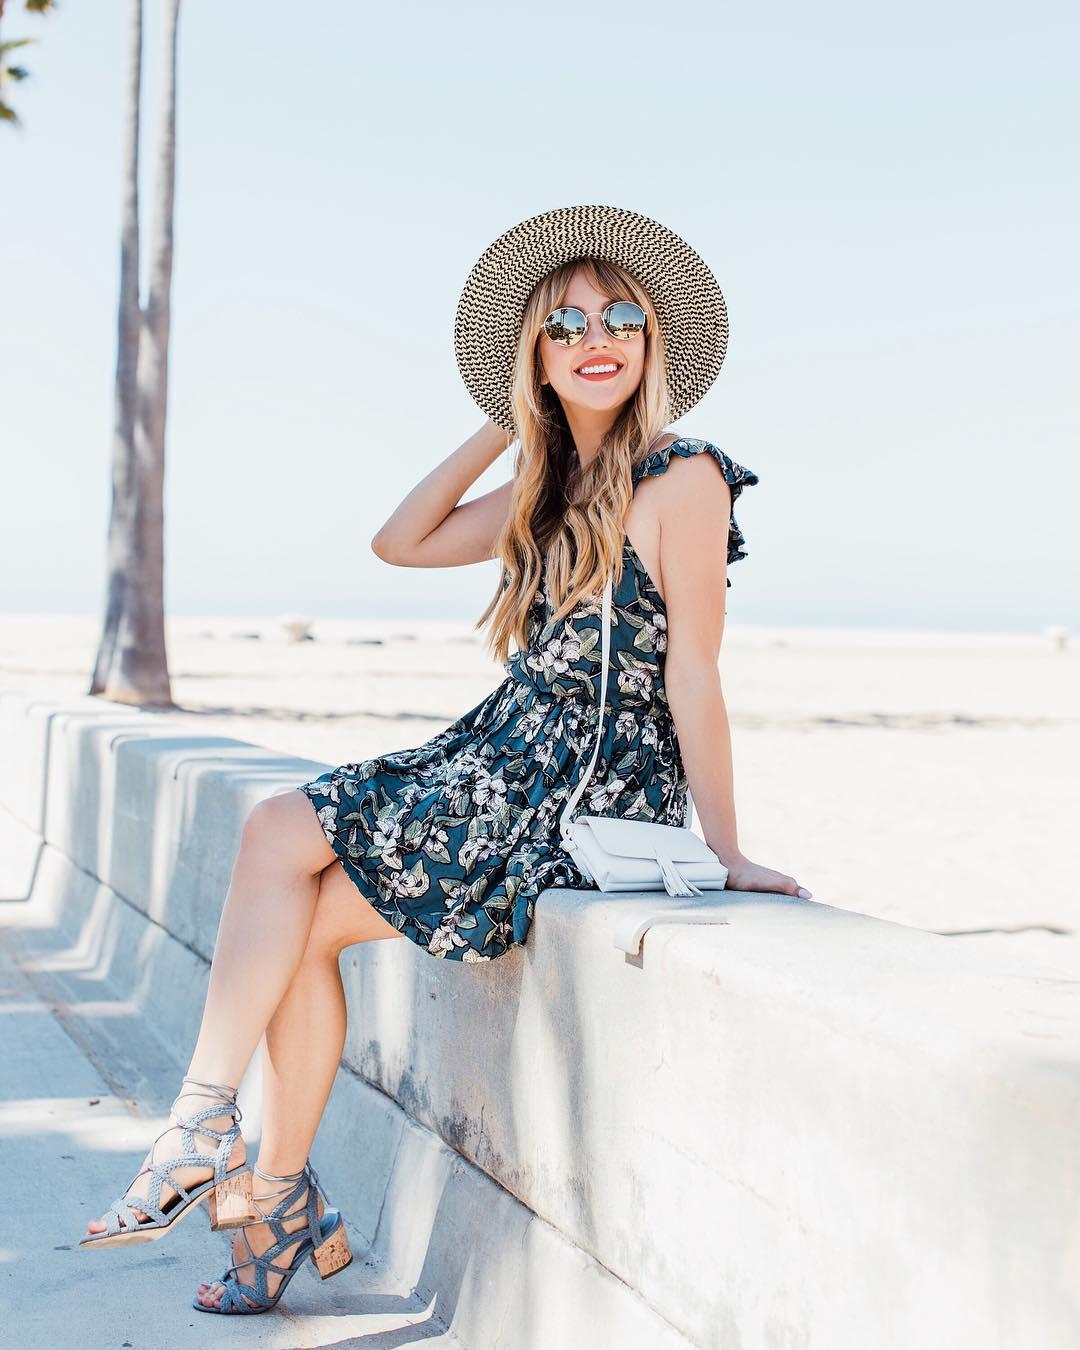 Tartan & Leather | Upbeat Soles | Orlando Florida Fashion Blog